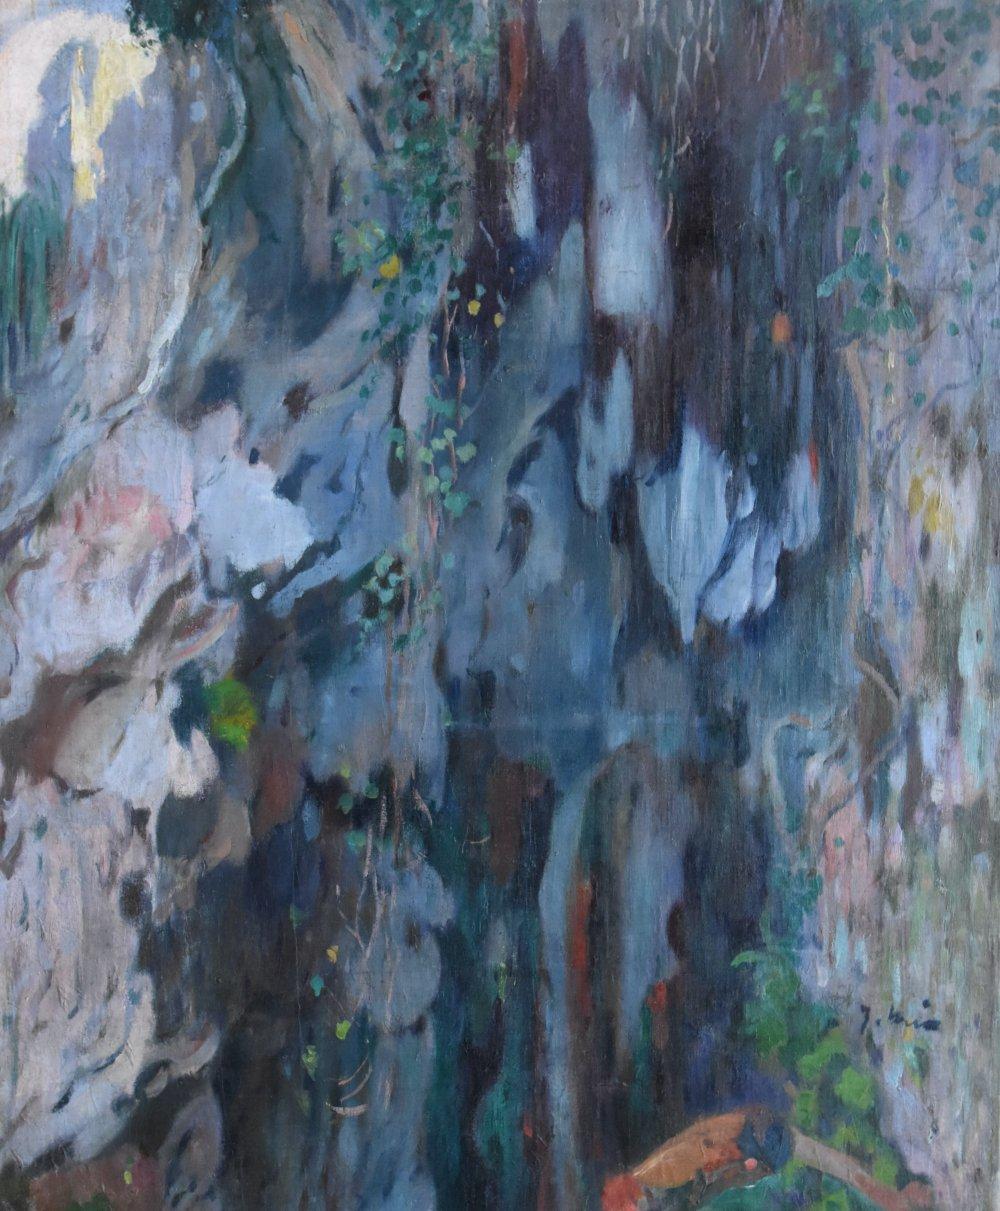 Cave of Mallorca (Sa Calobra)